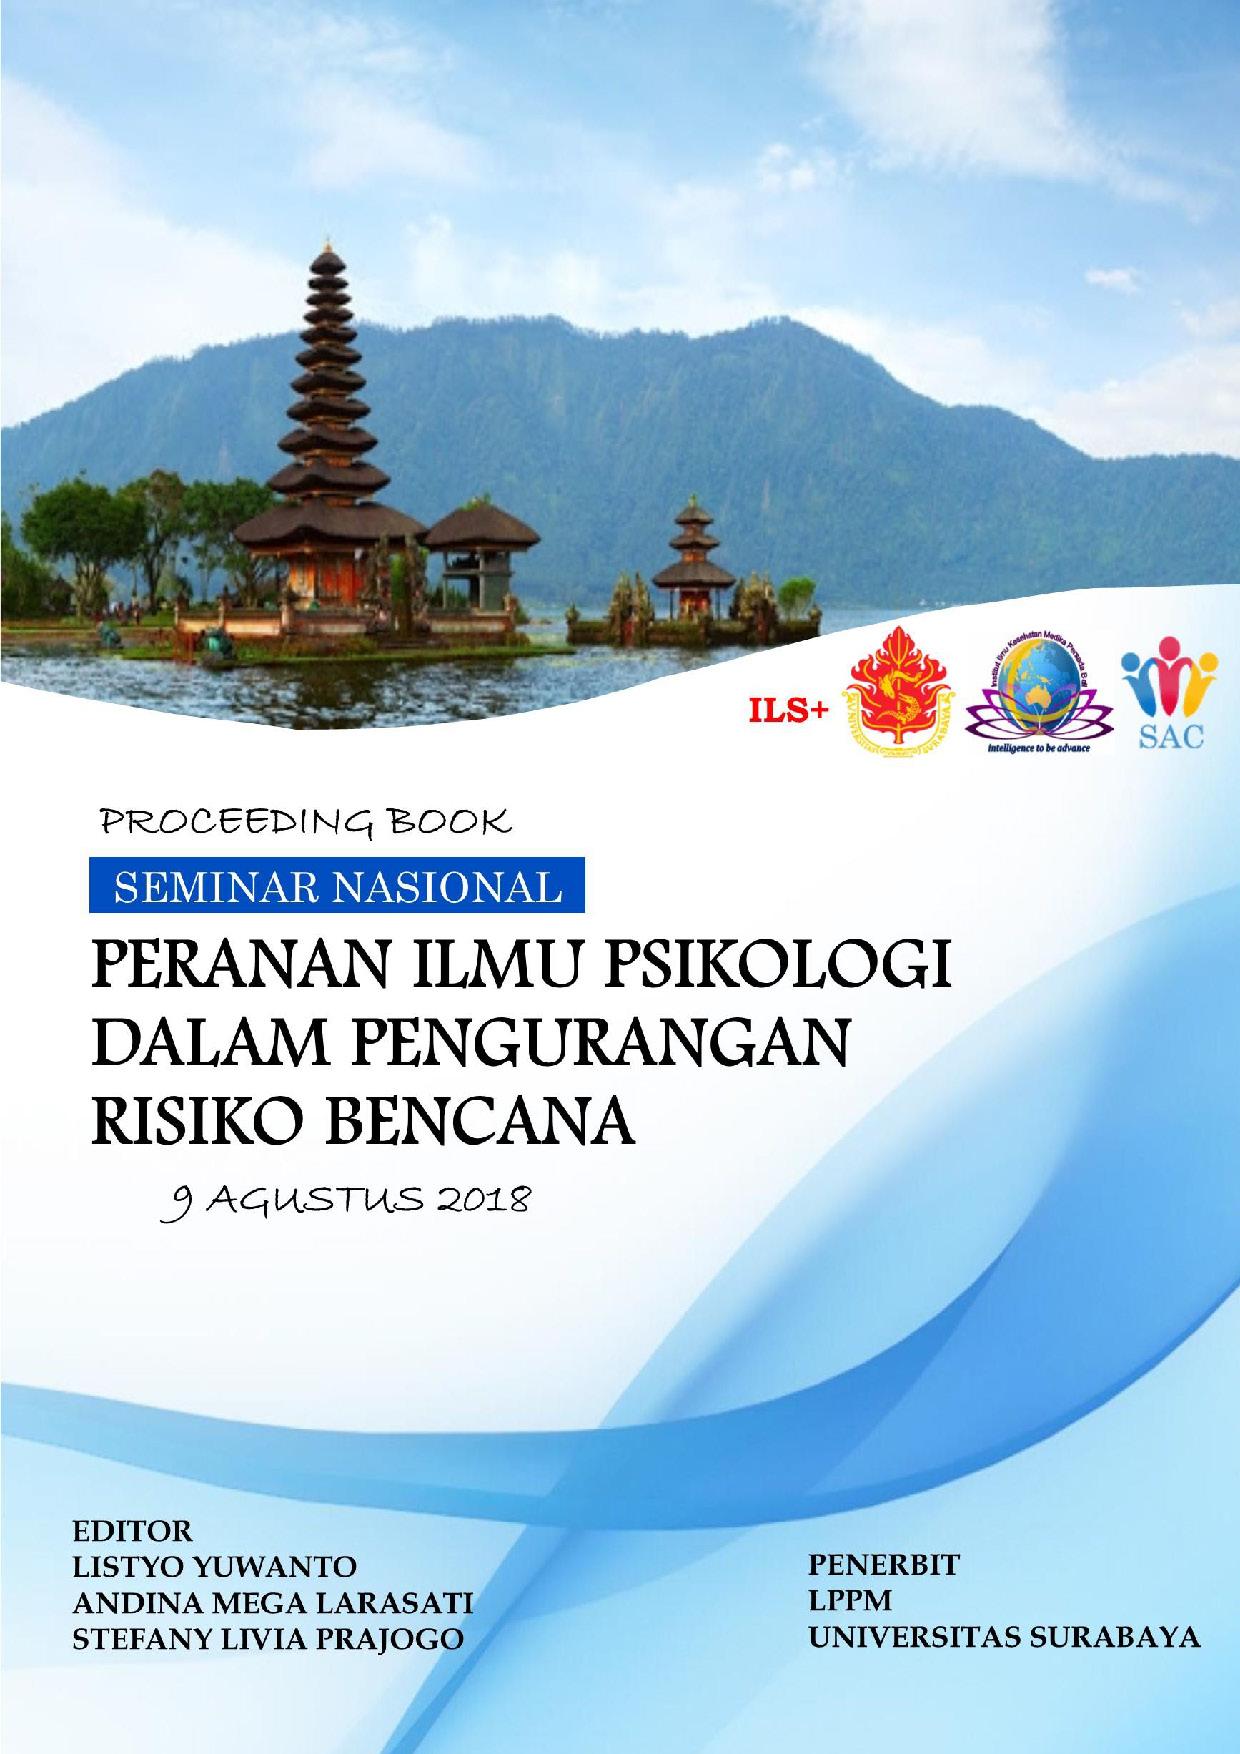 Cover of Seminar Nasional Psikologi Bencana